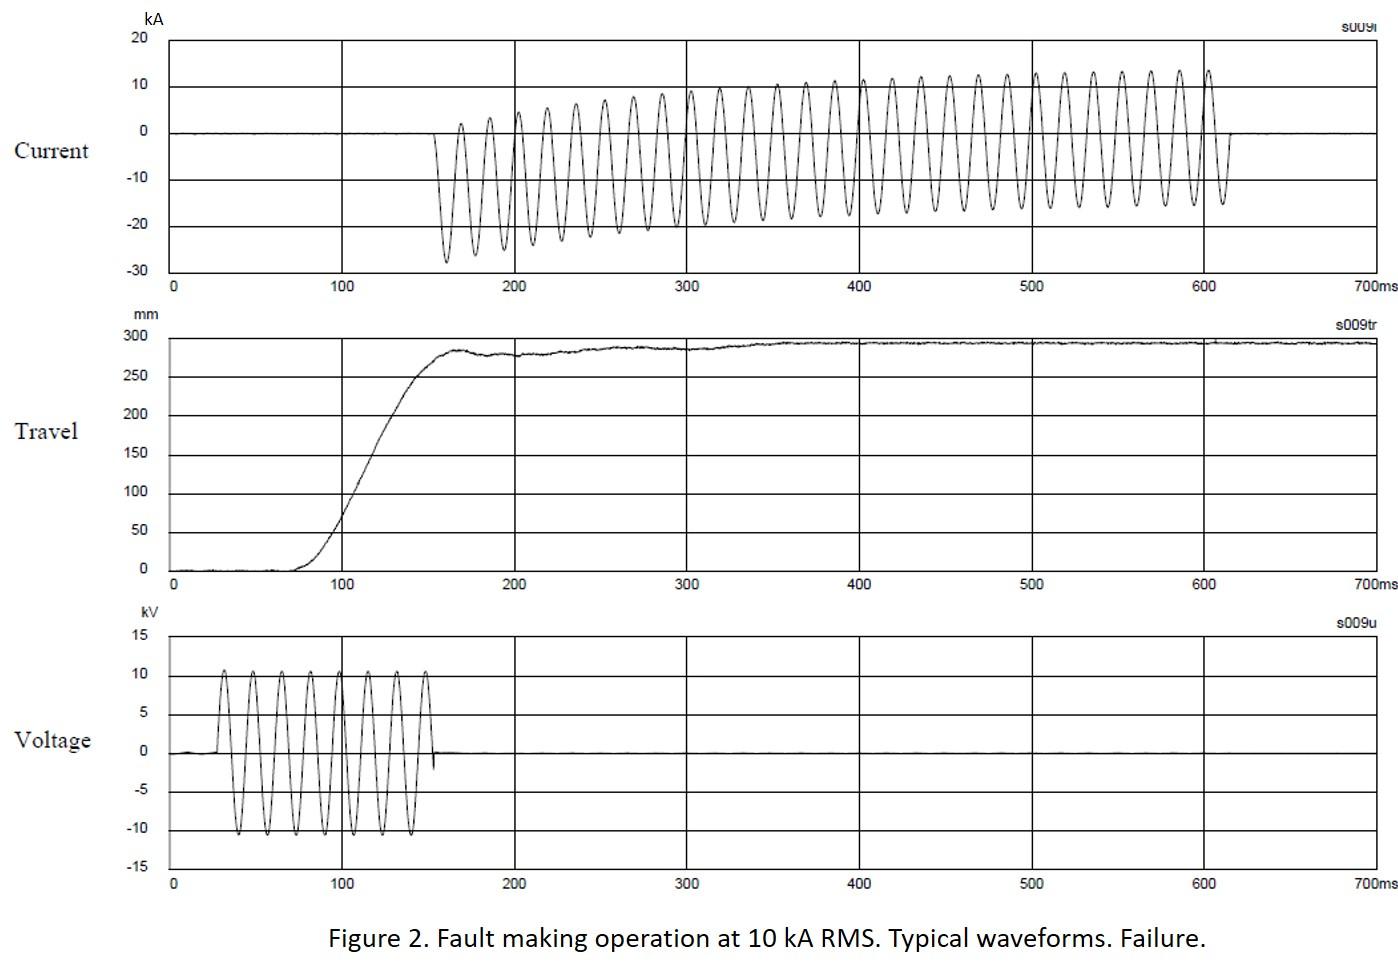 P11-12_Waveforms.jpg